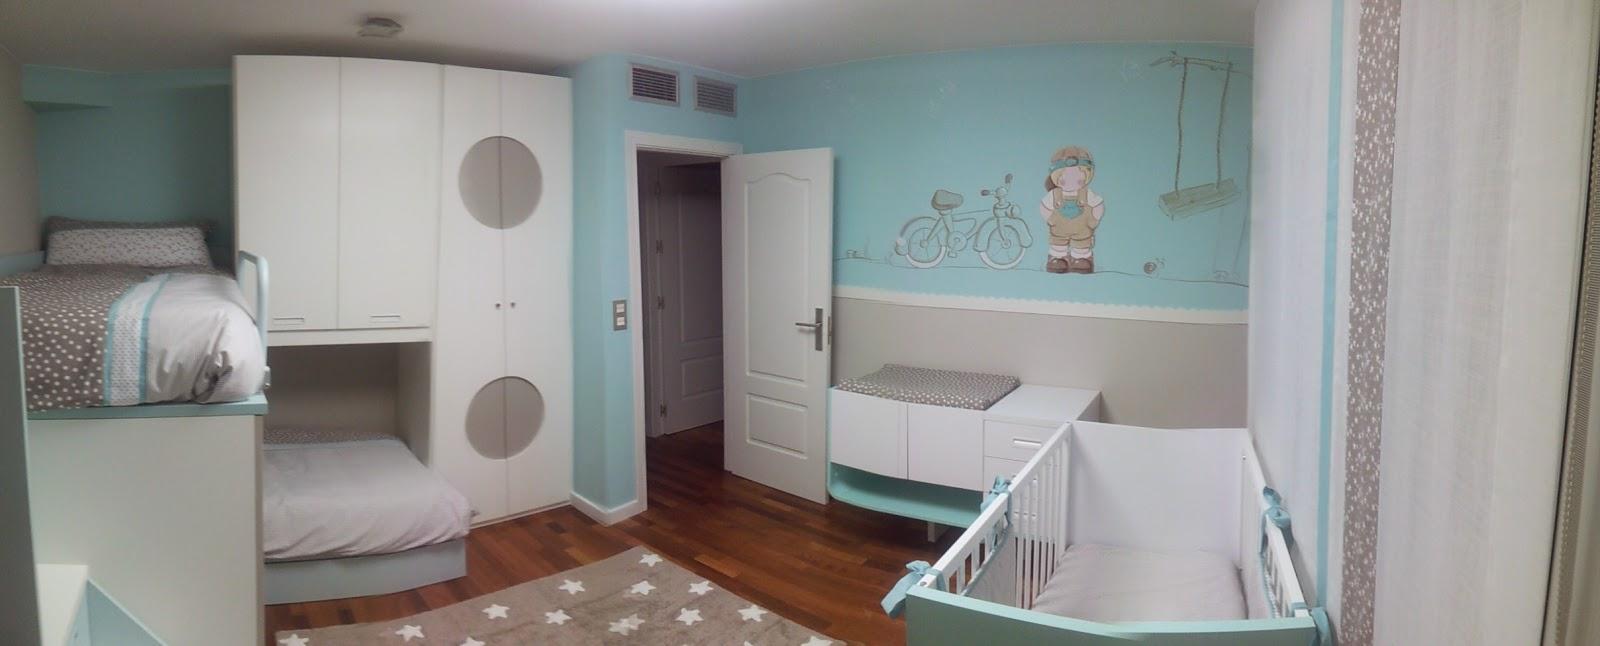 Deco chambre b b d coration chambre d 39 enfant for Chambre d enfant decoration